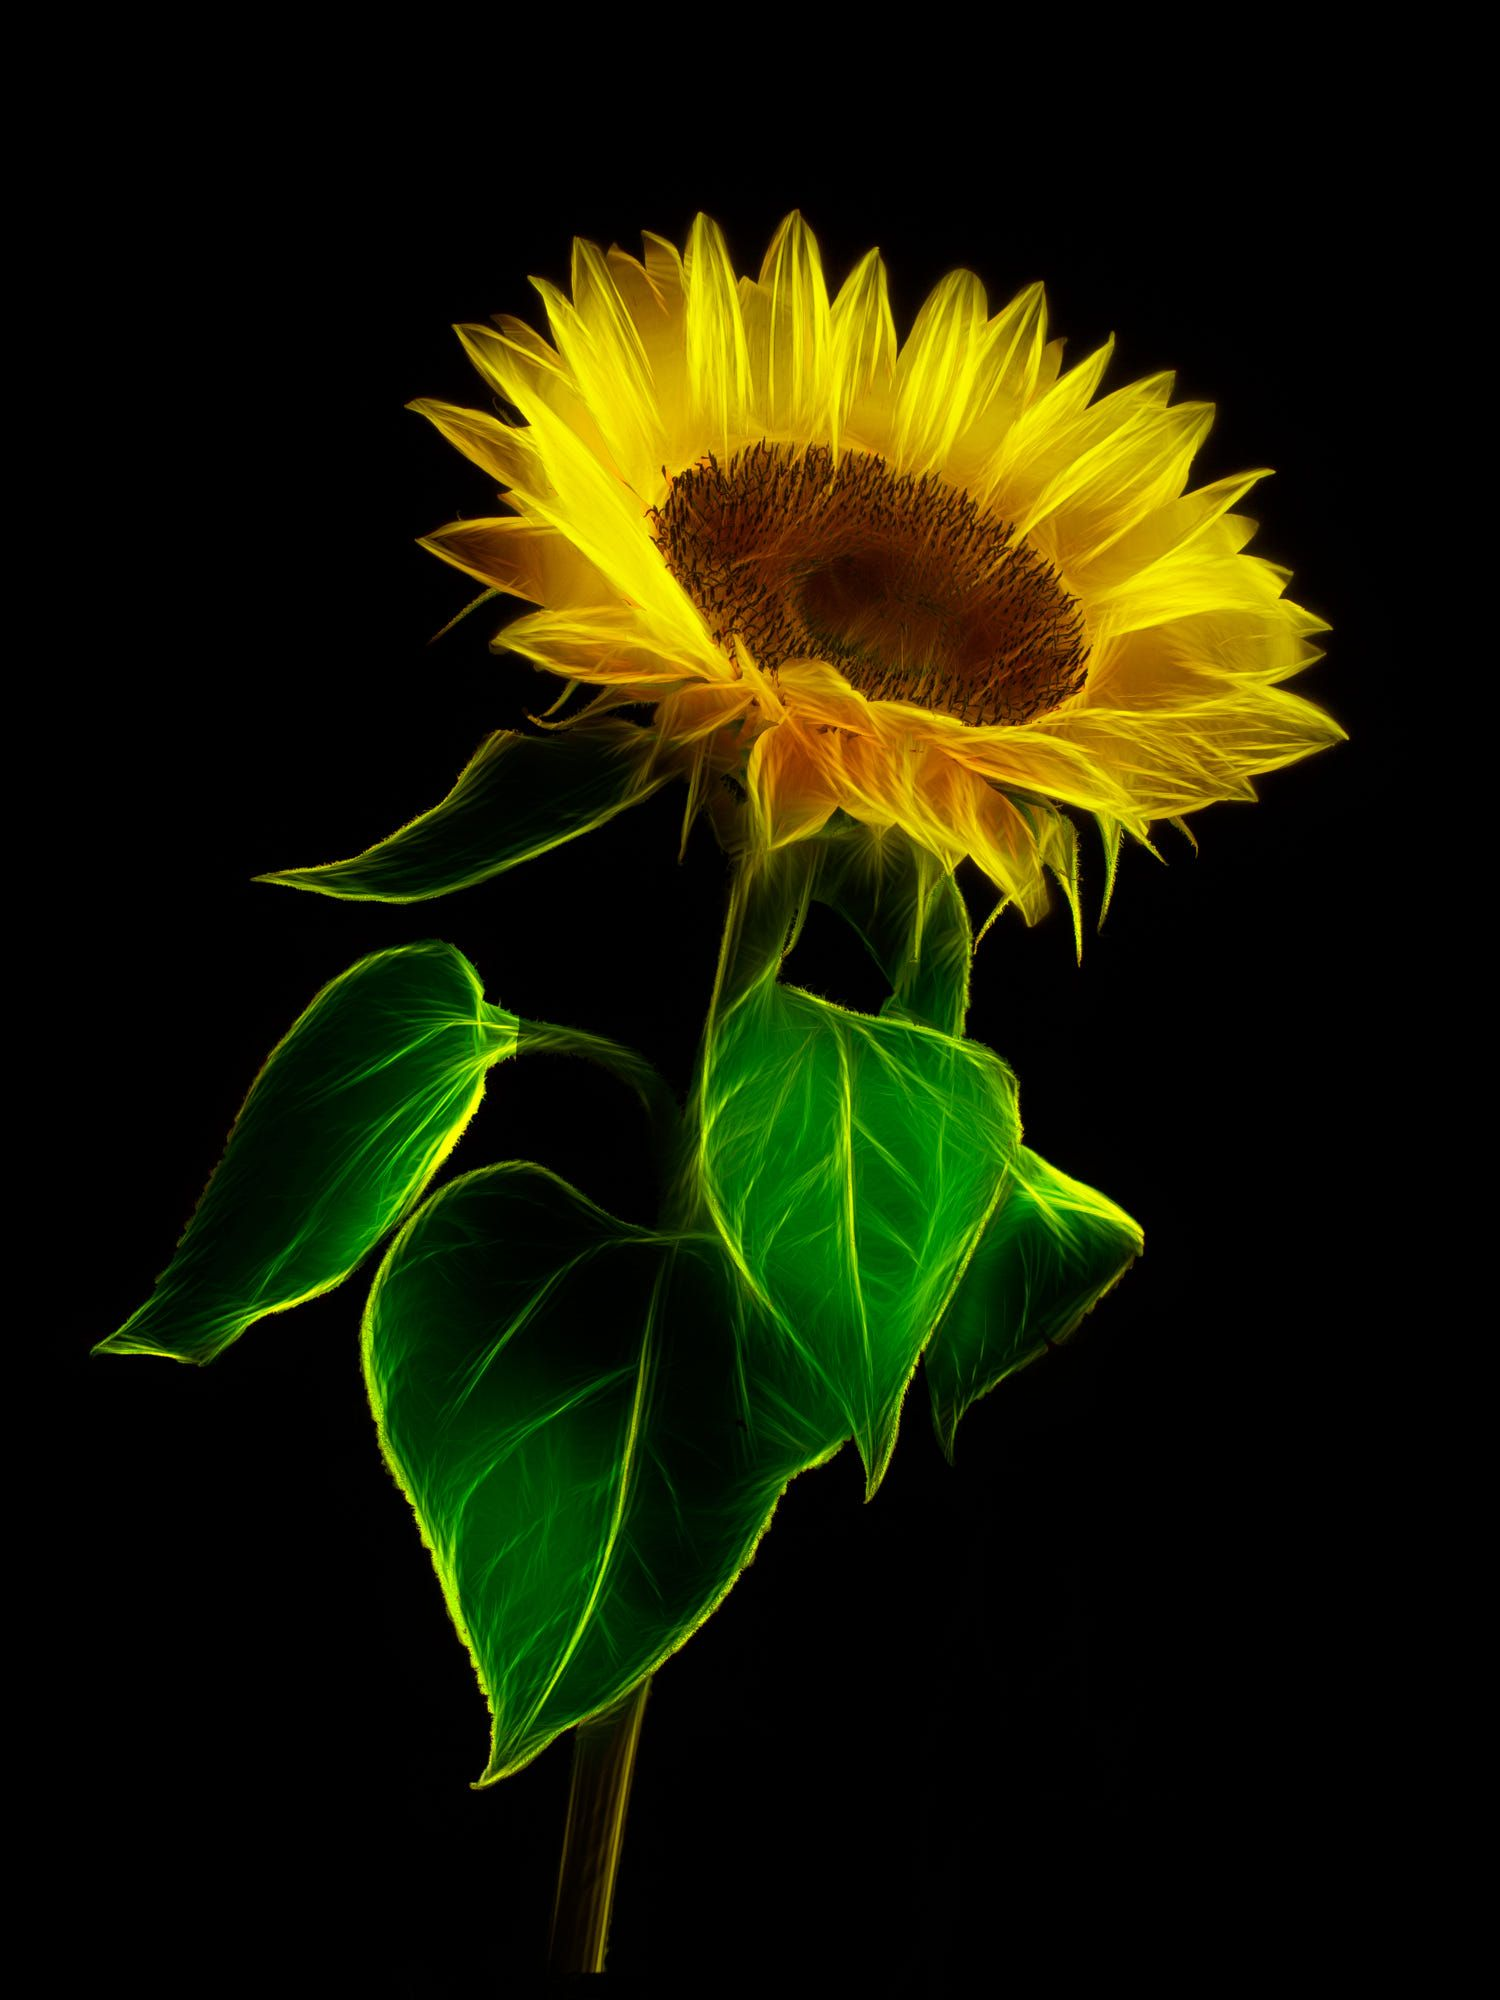 Sunflower by Zdenek Novak | Sunflower pictures, Sunflower ...